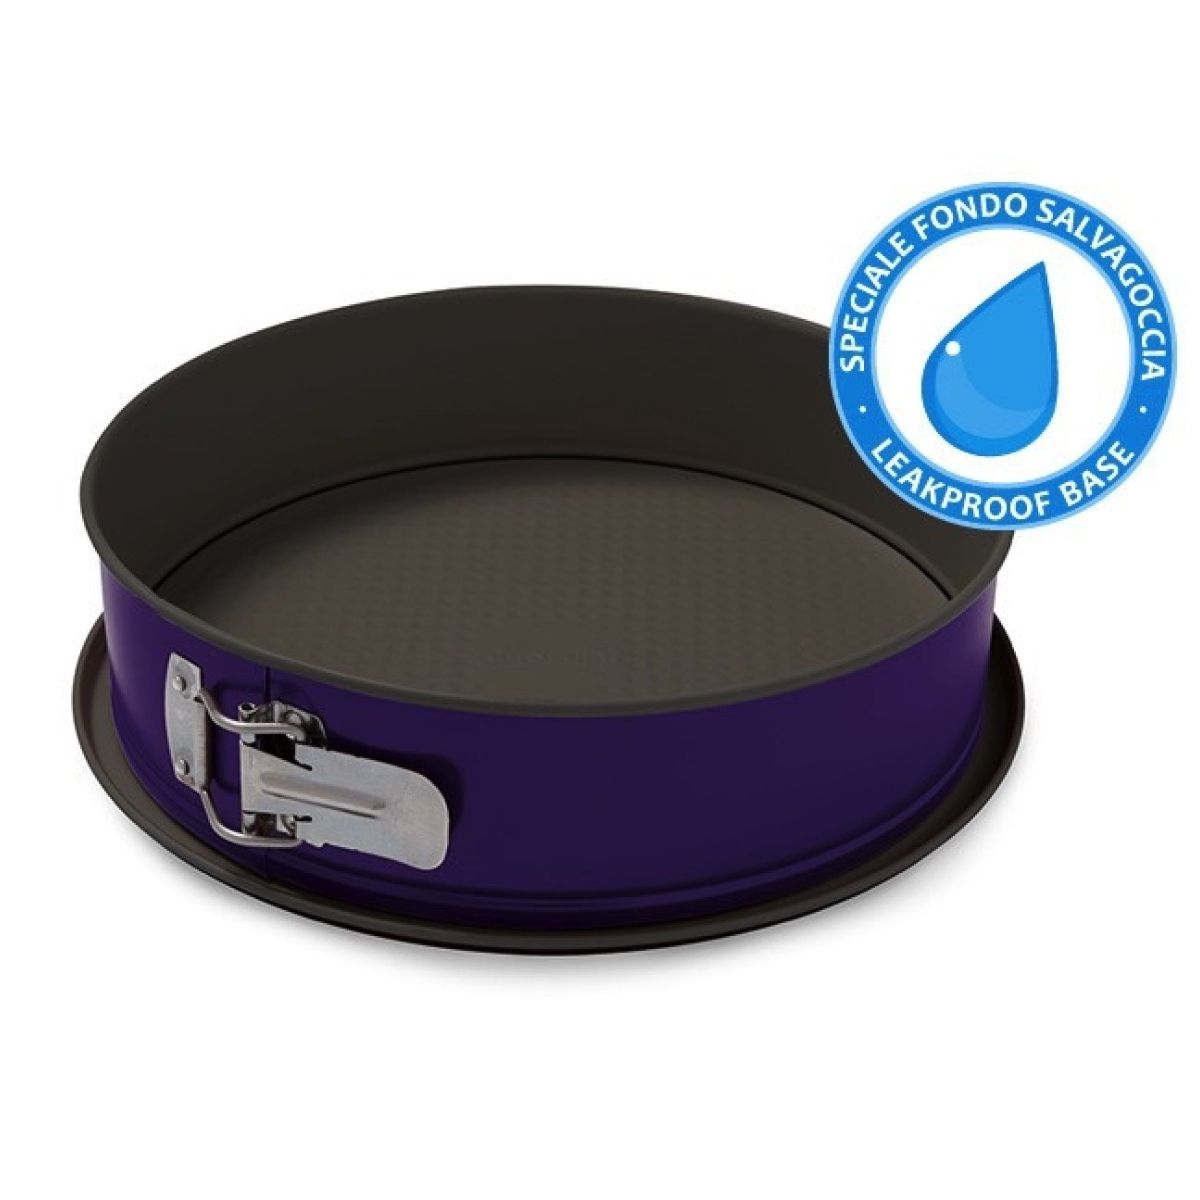 GUARDINI - Smart Colors 26cm 彈簧扣平低焗盤 - 紫色